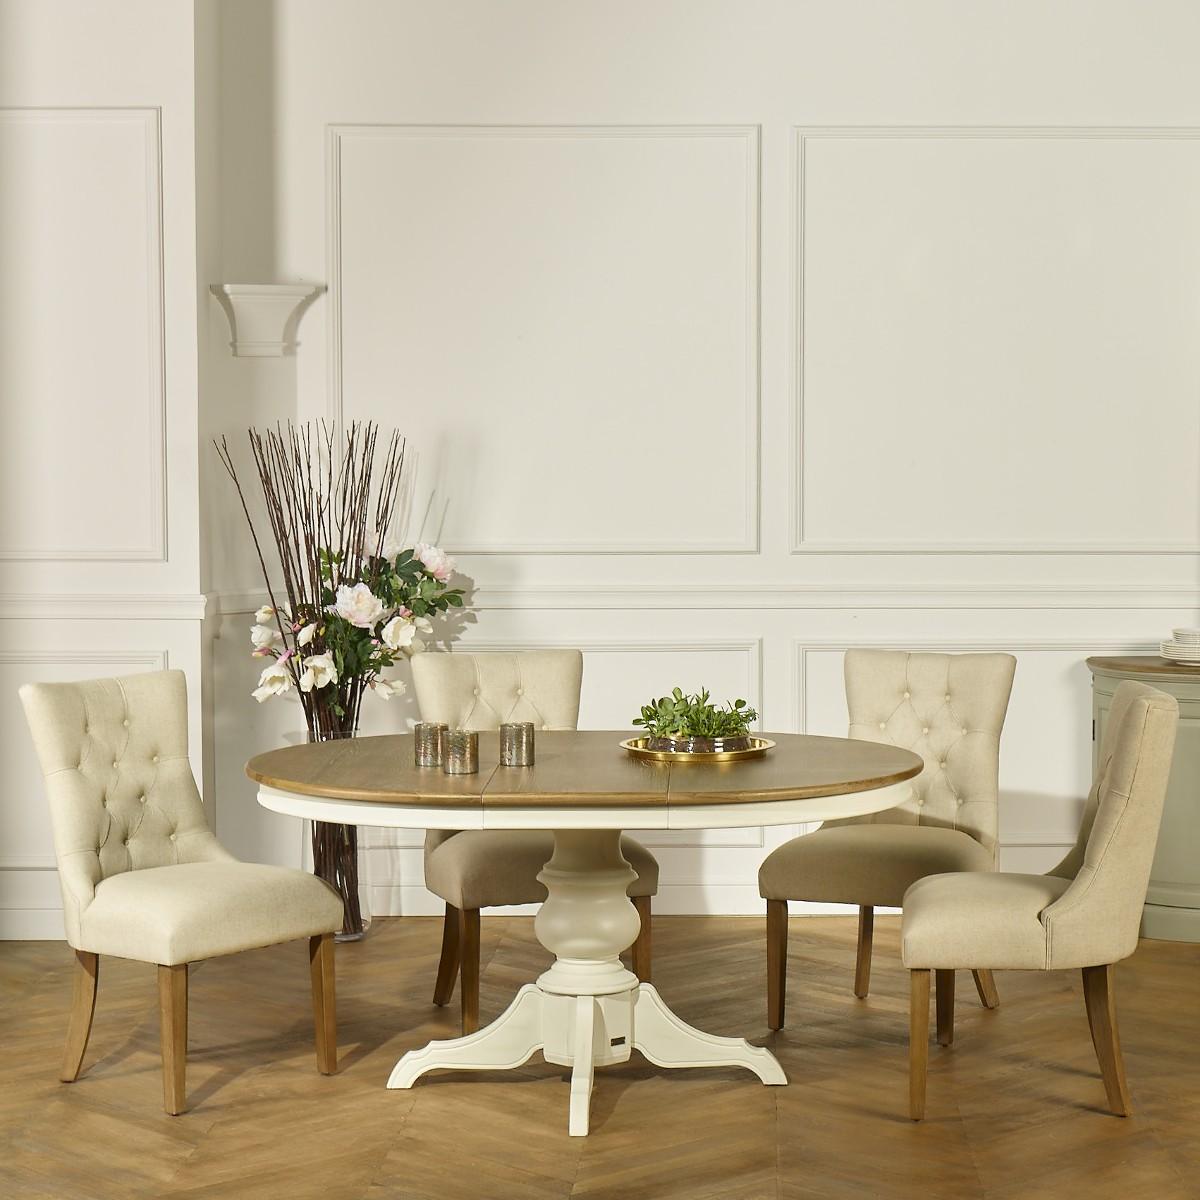 The Ariane Dining Table Cream Robin Des Bois